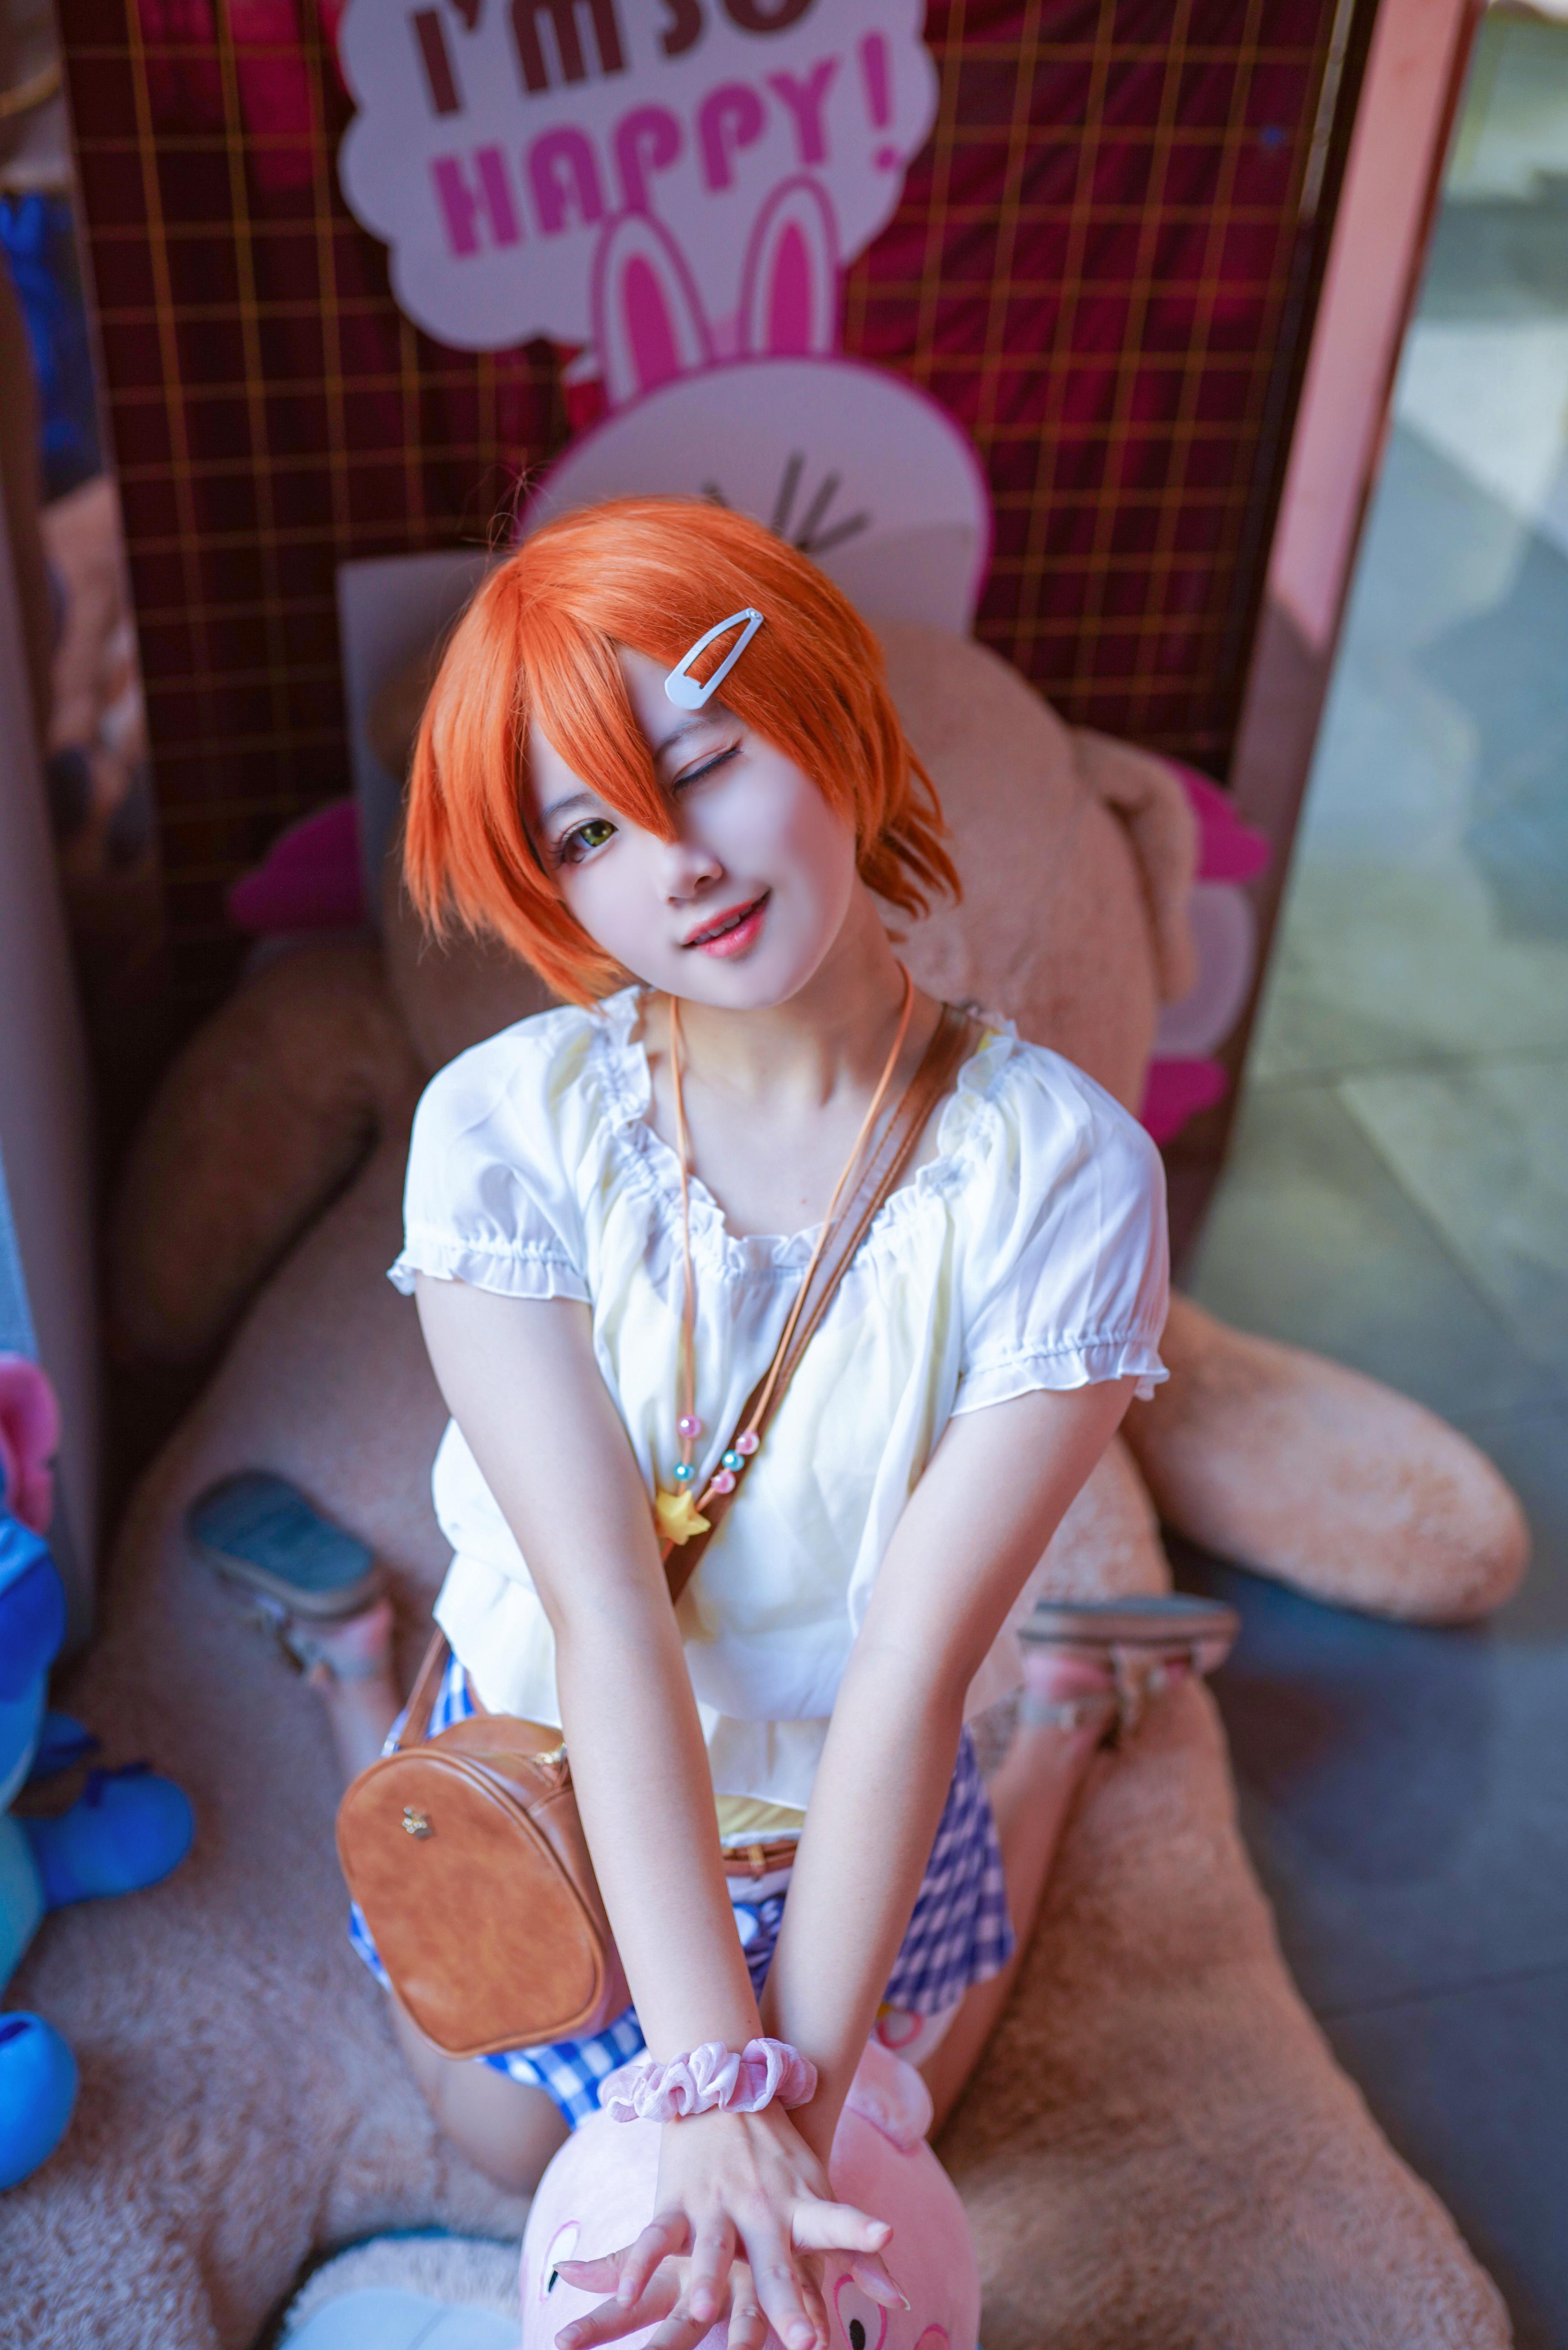 《LOVE LIVE!》少女cosplay【CN:_李笑颜Lee】-第15张